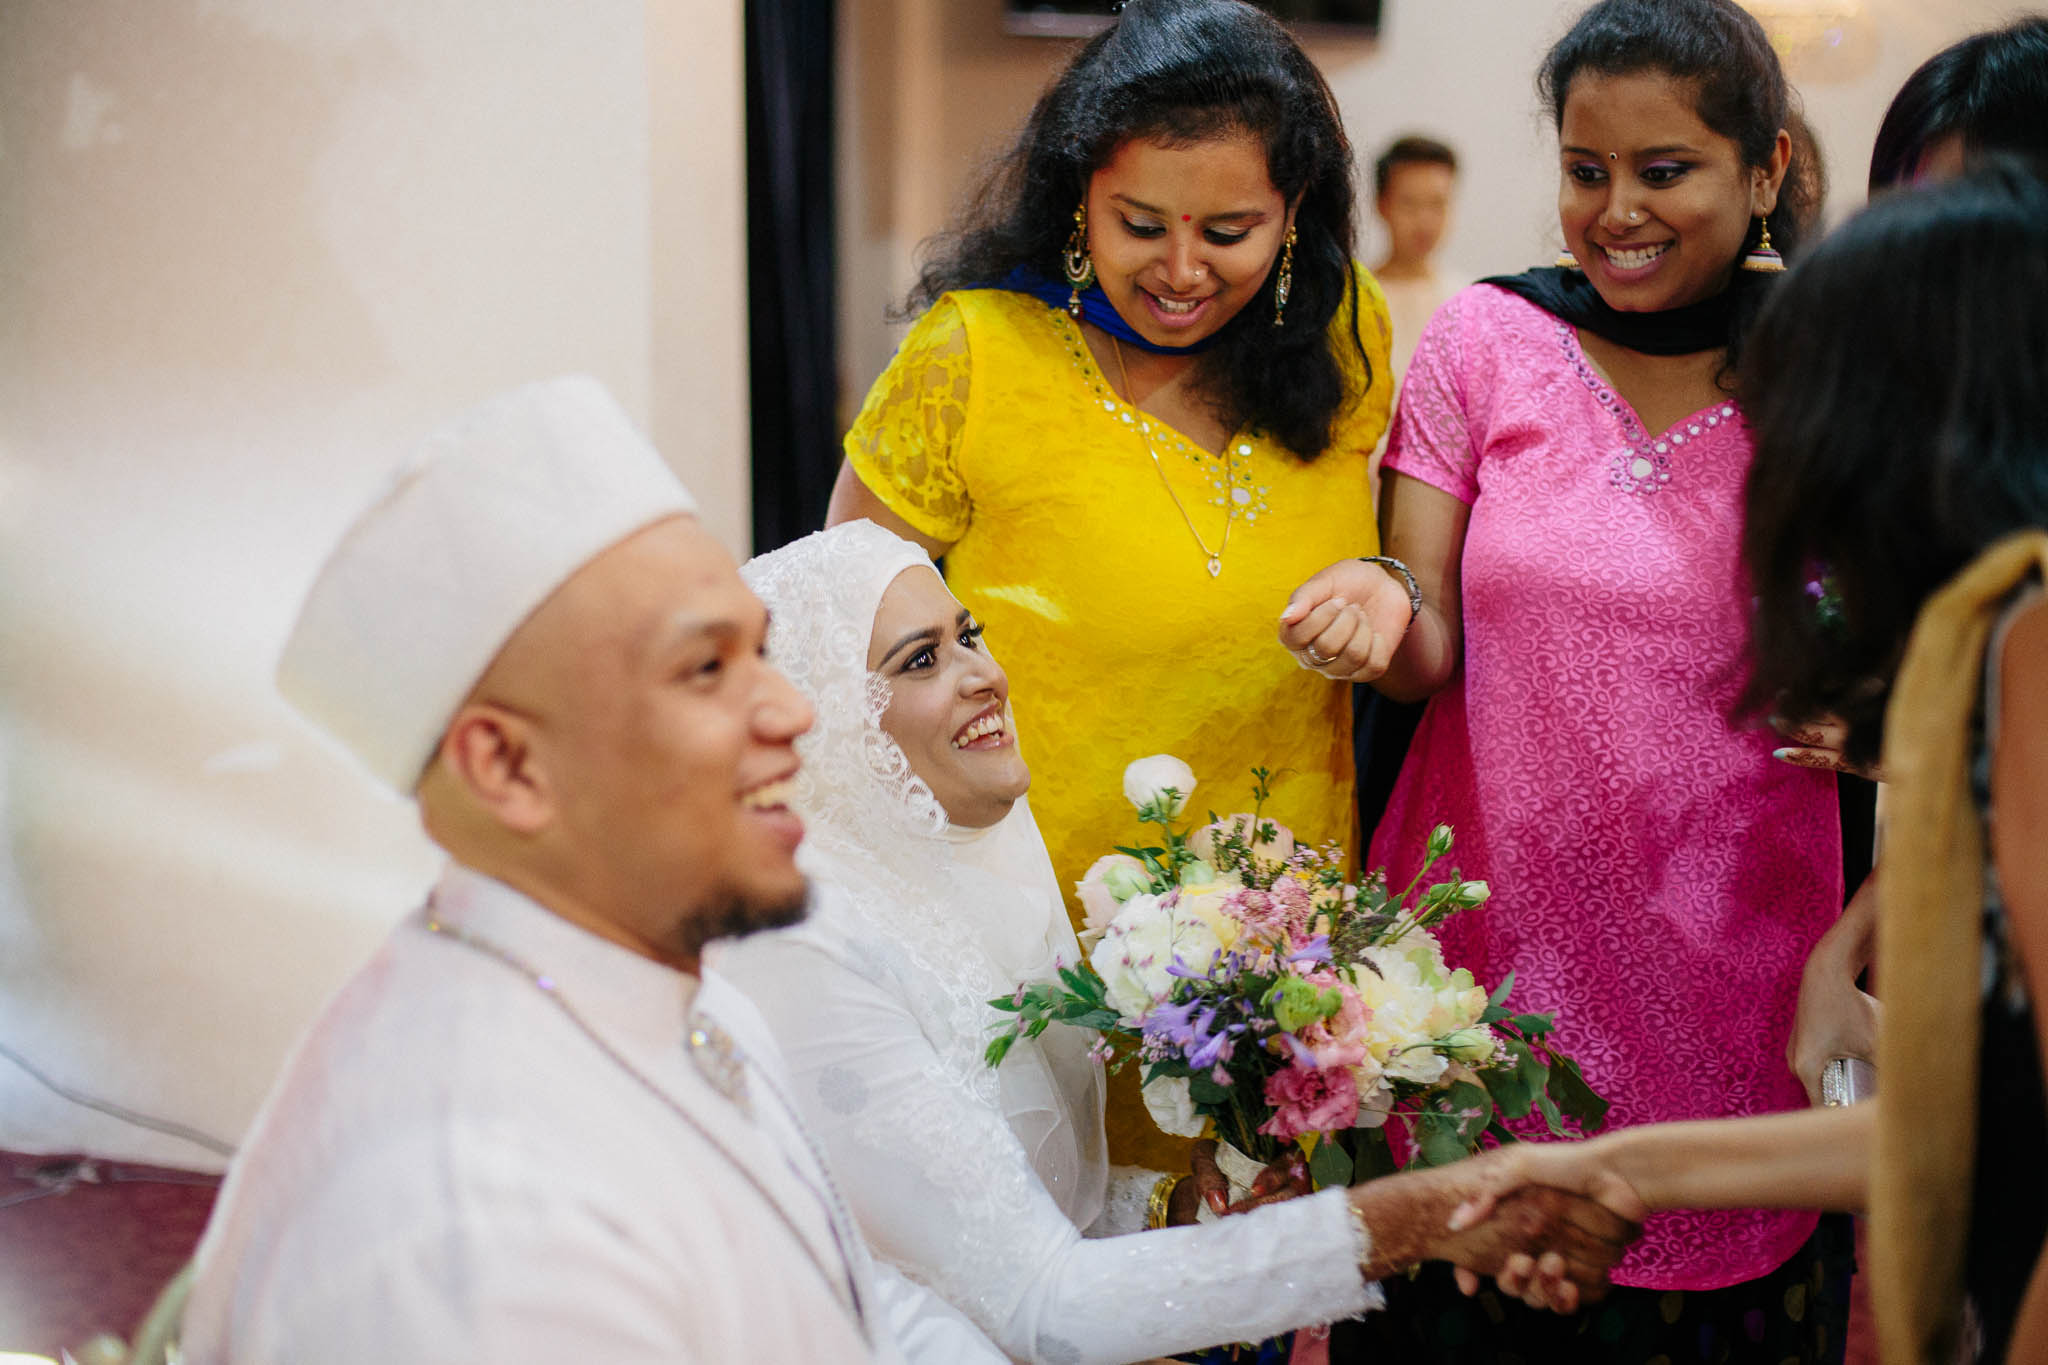 singapore-wedding-photographer-malay-indian-pre-wedding-travel-wmt-2015-shereen-farid-35.jpg